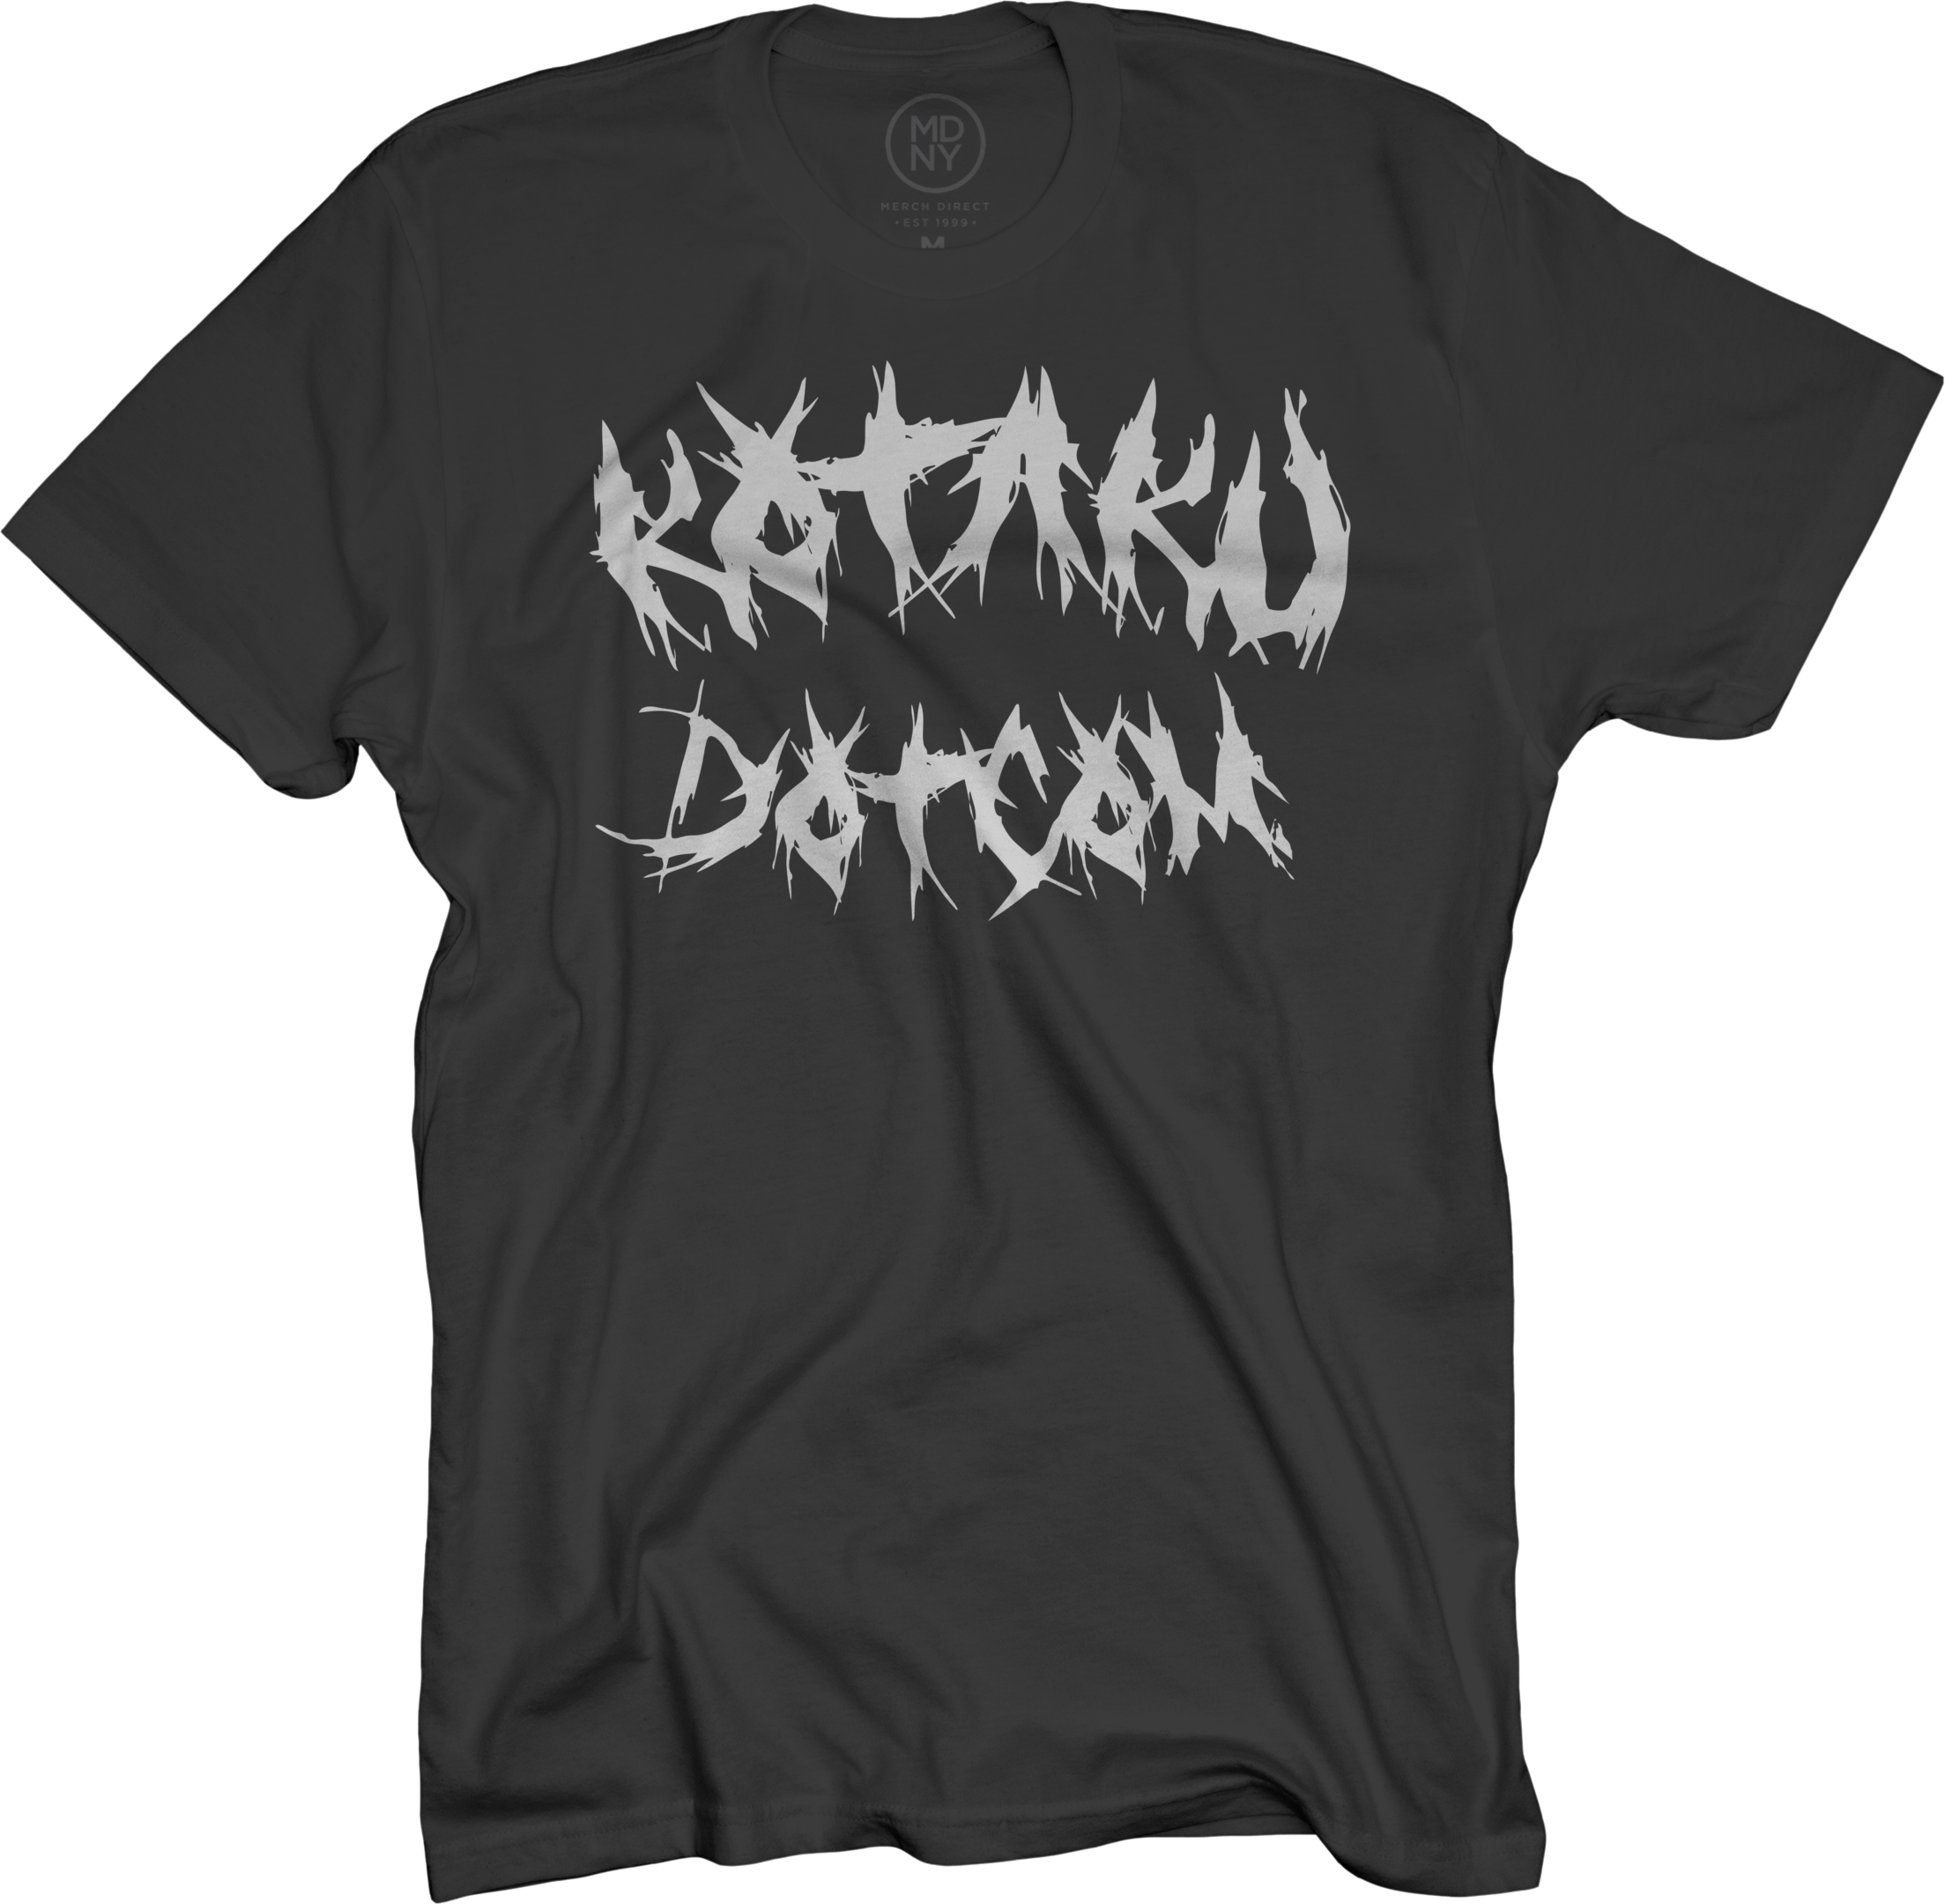 Metal on Black T-Shirt